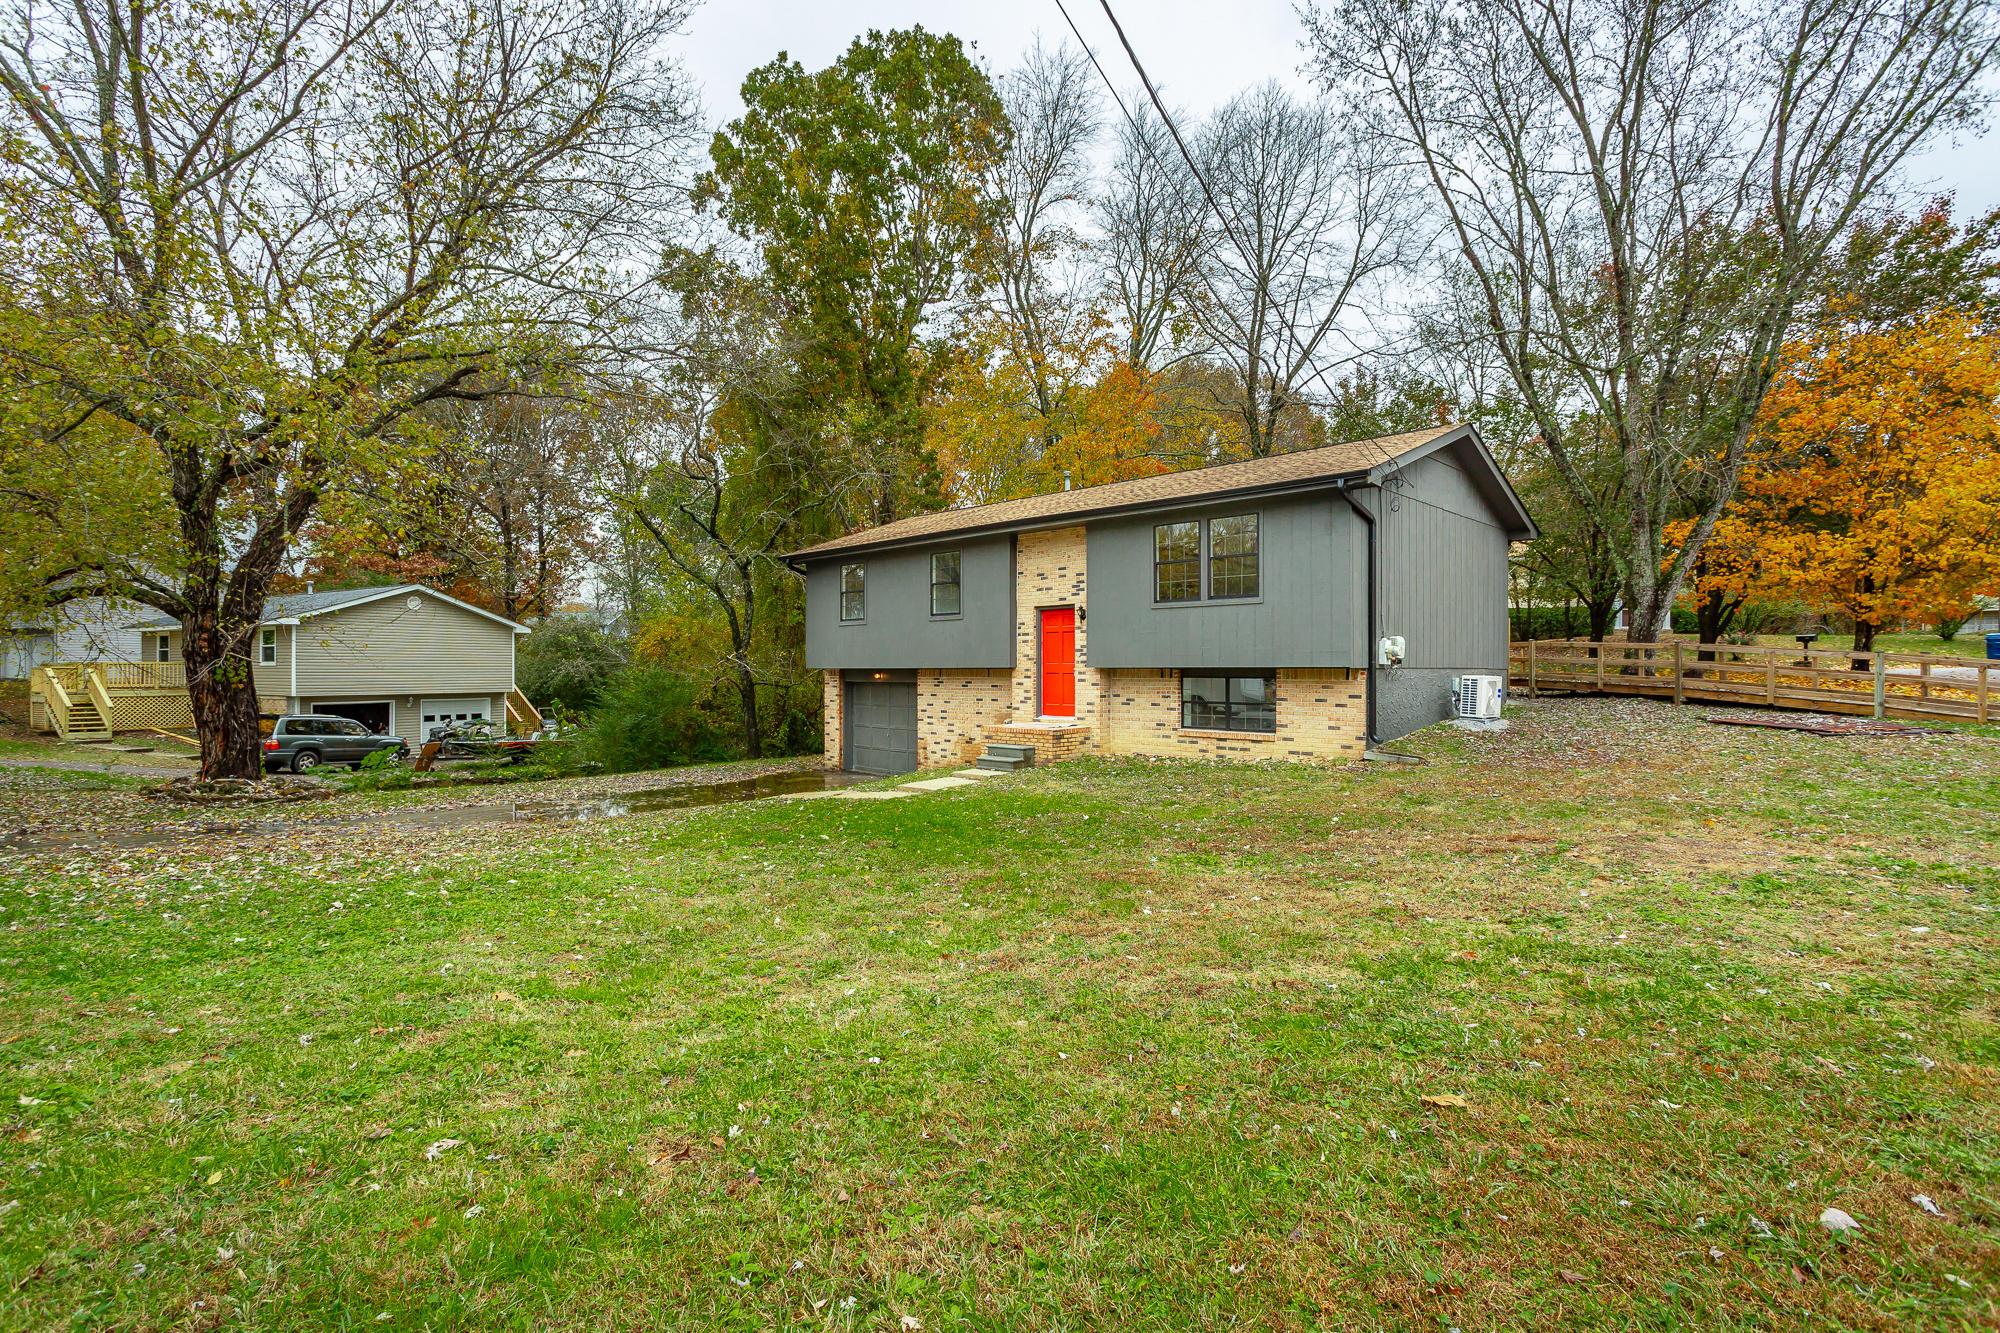 812 Northbrook Dr, Hixson, TN 37343